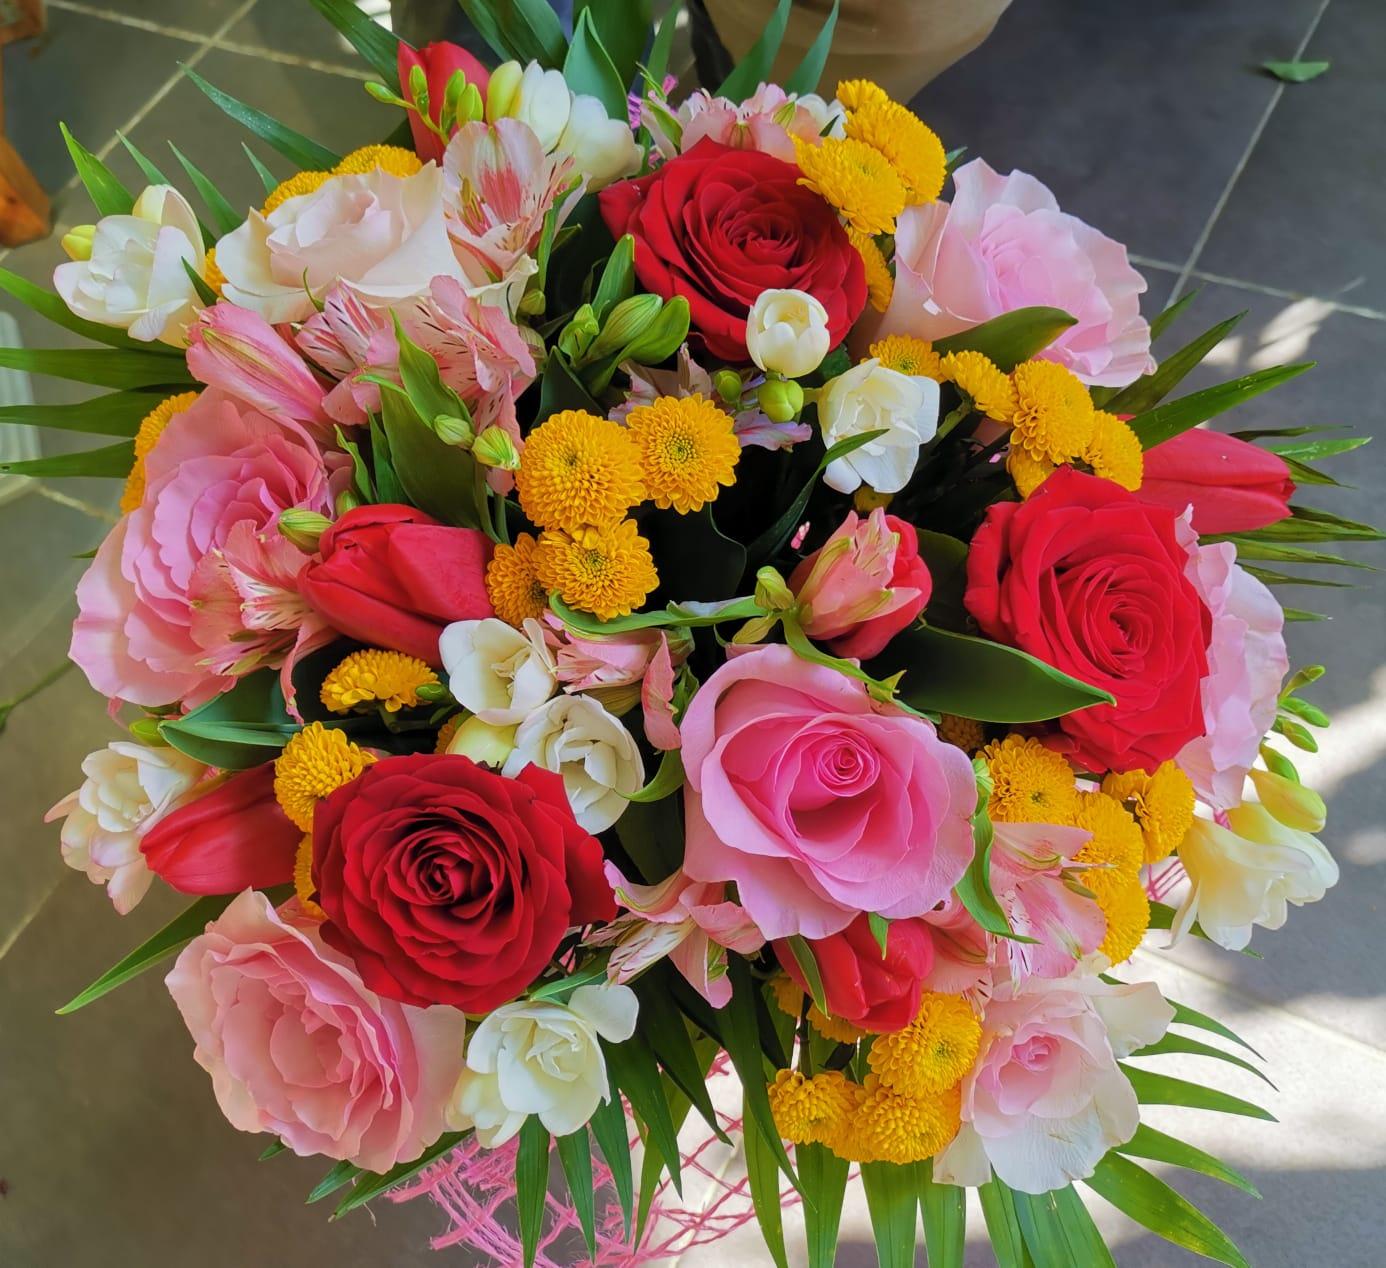 Buchet 9 trandafiri ,10 frezii albe, 8 santini galben 6 lalele rosii, 4 astromeria  preț 200 lei